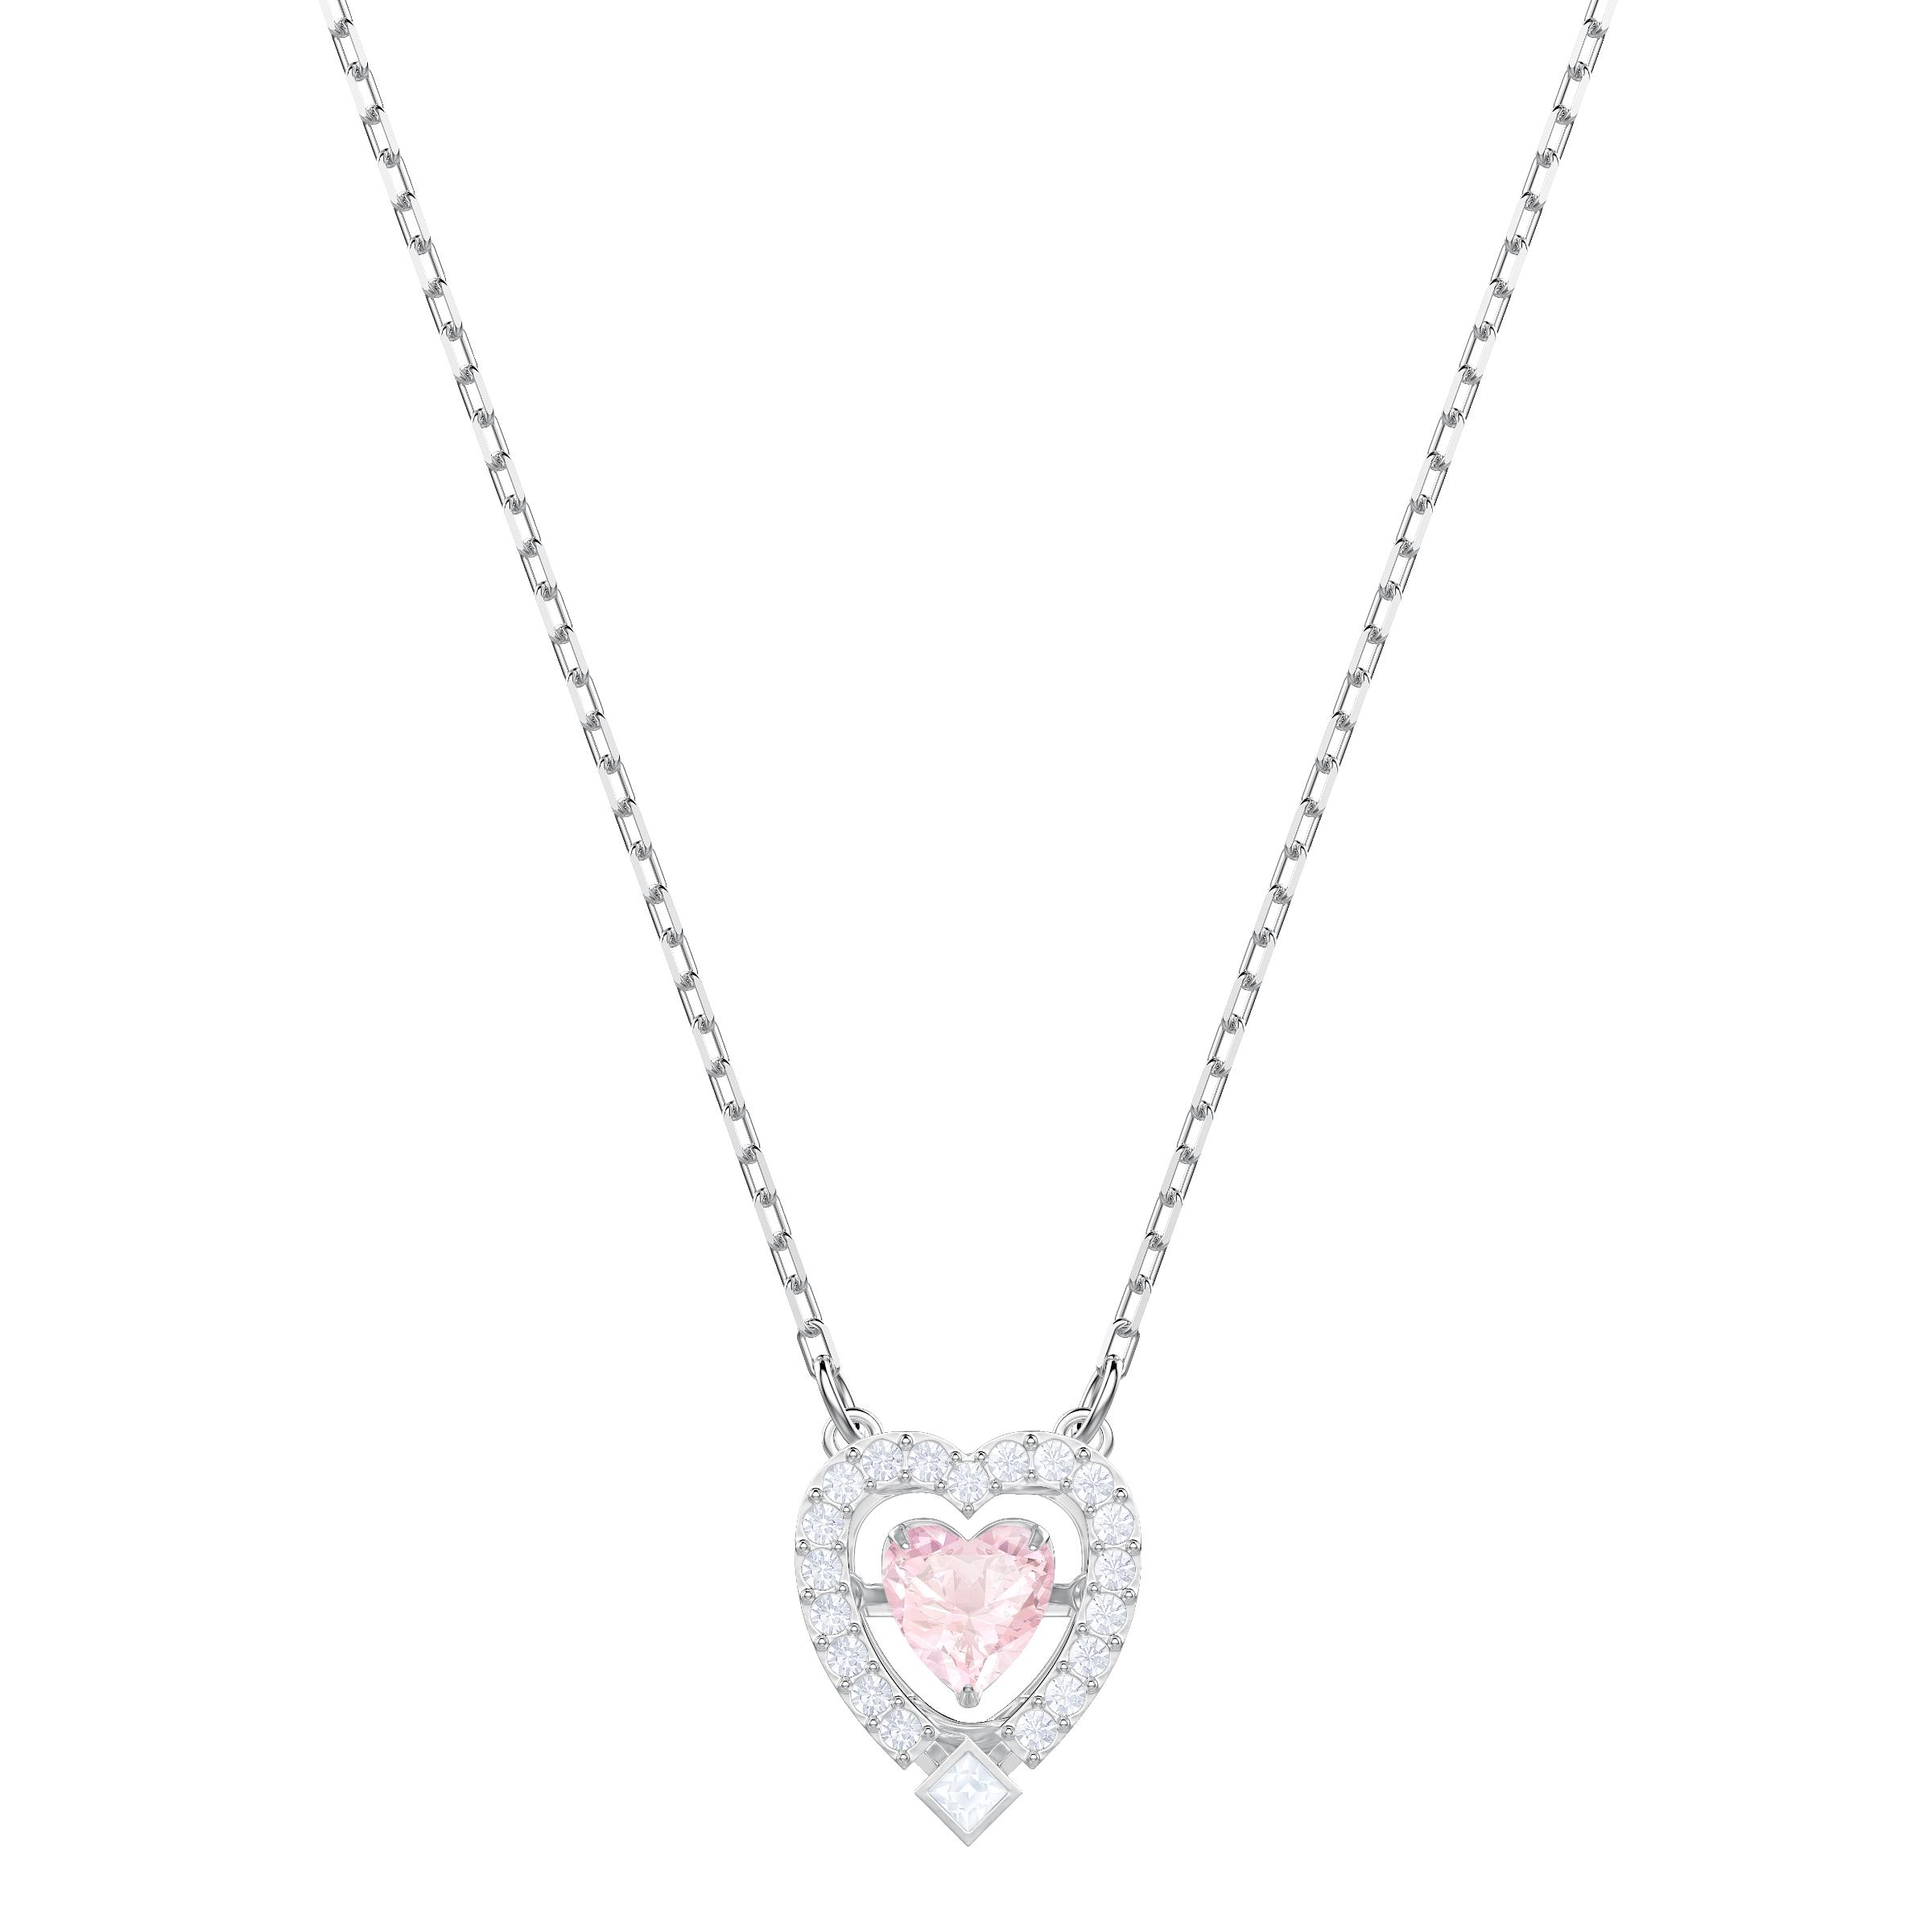 Sparkling Dance Heart Necklace, Pink, Rhodium plating